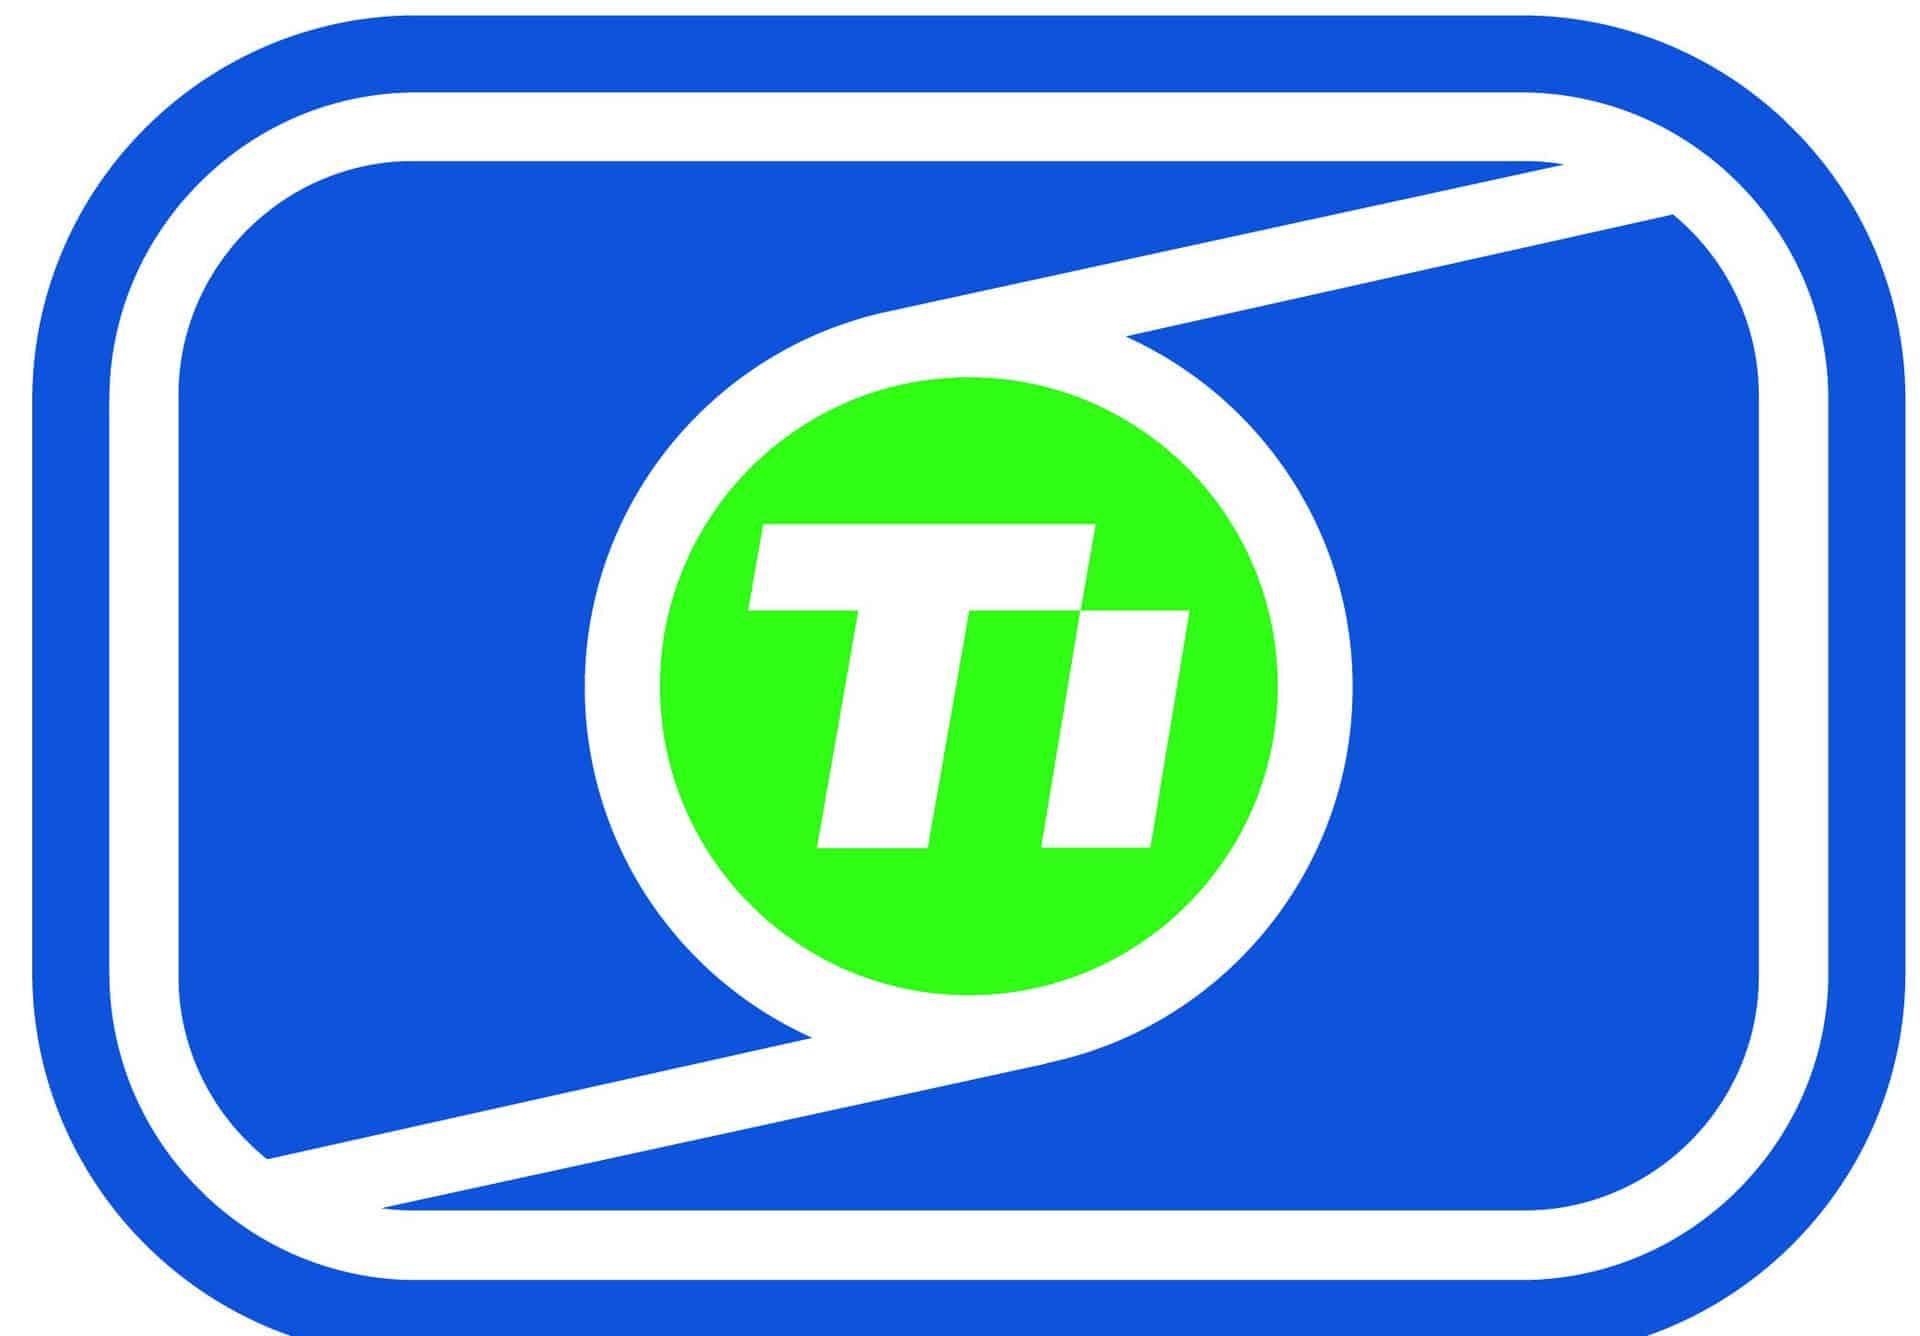 Ti Brandmark Monogram PMS Ti Brandmark Monogram CMYK